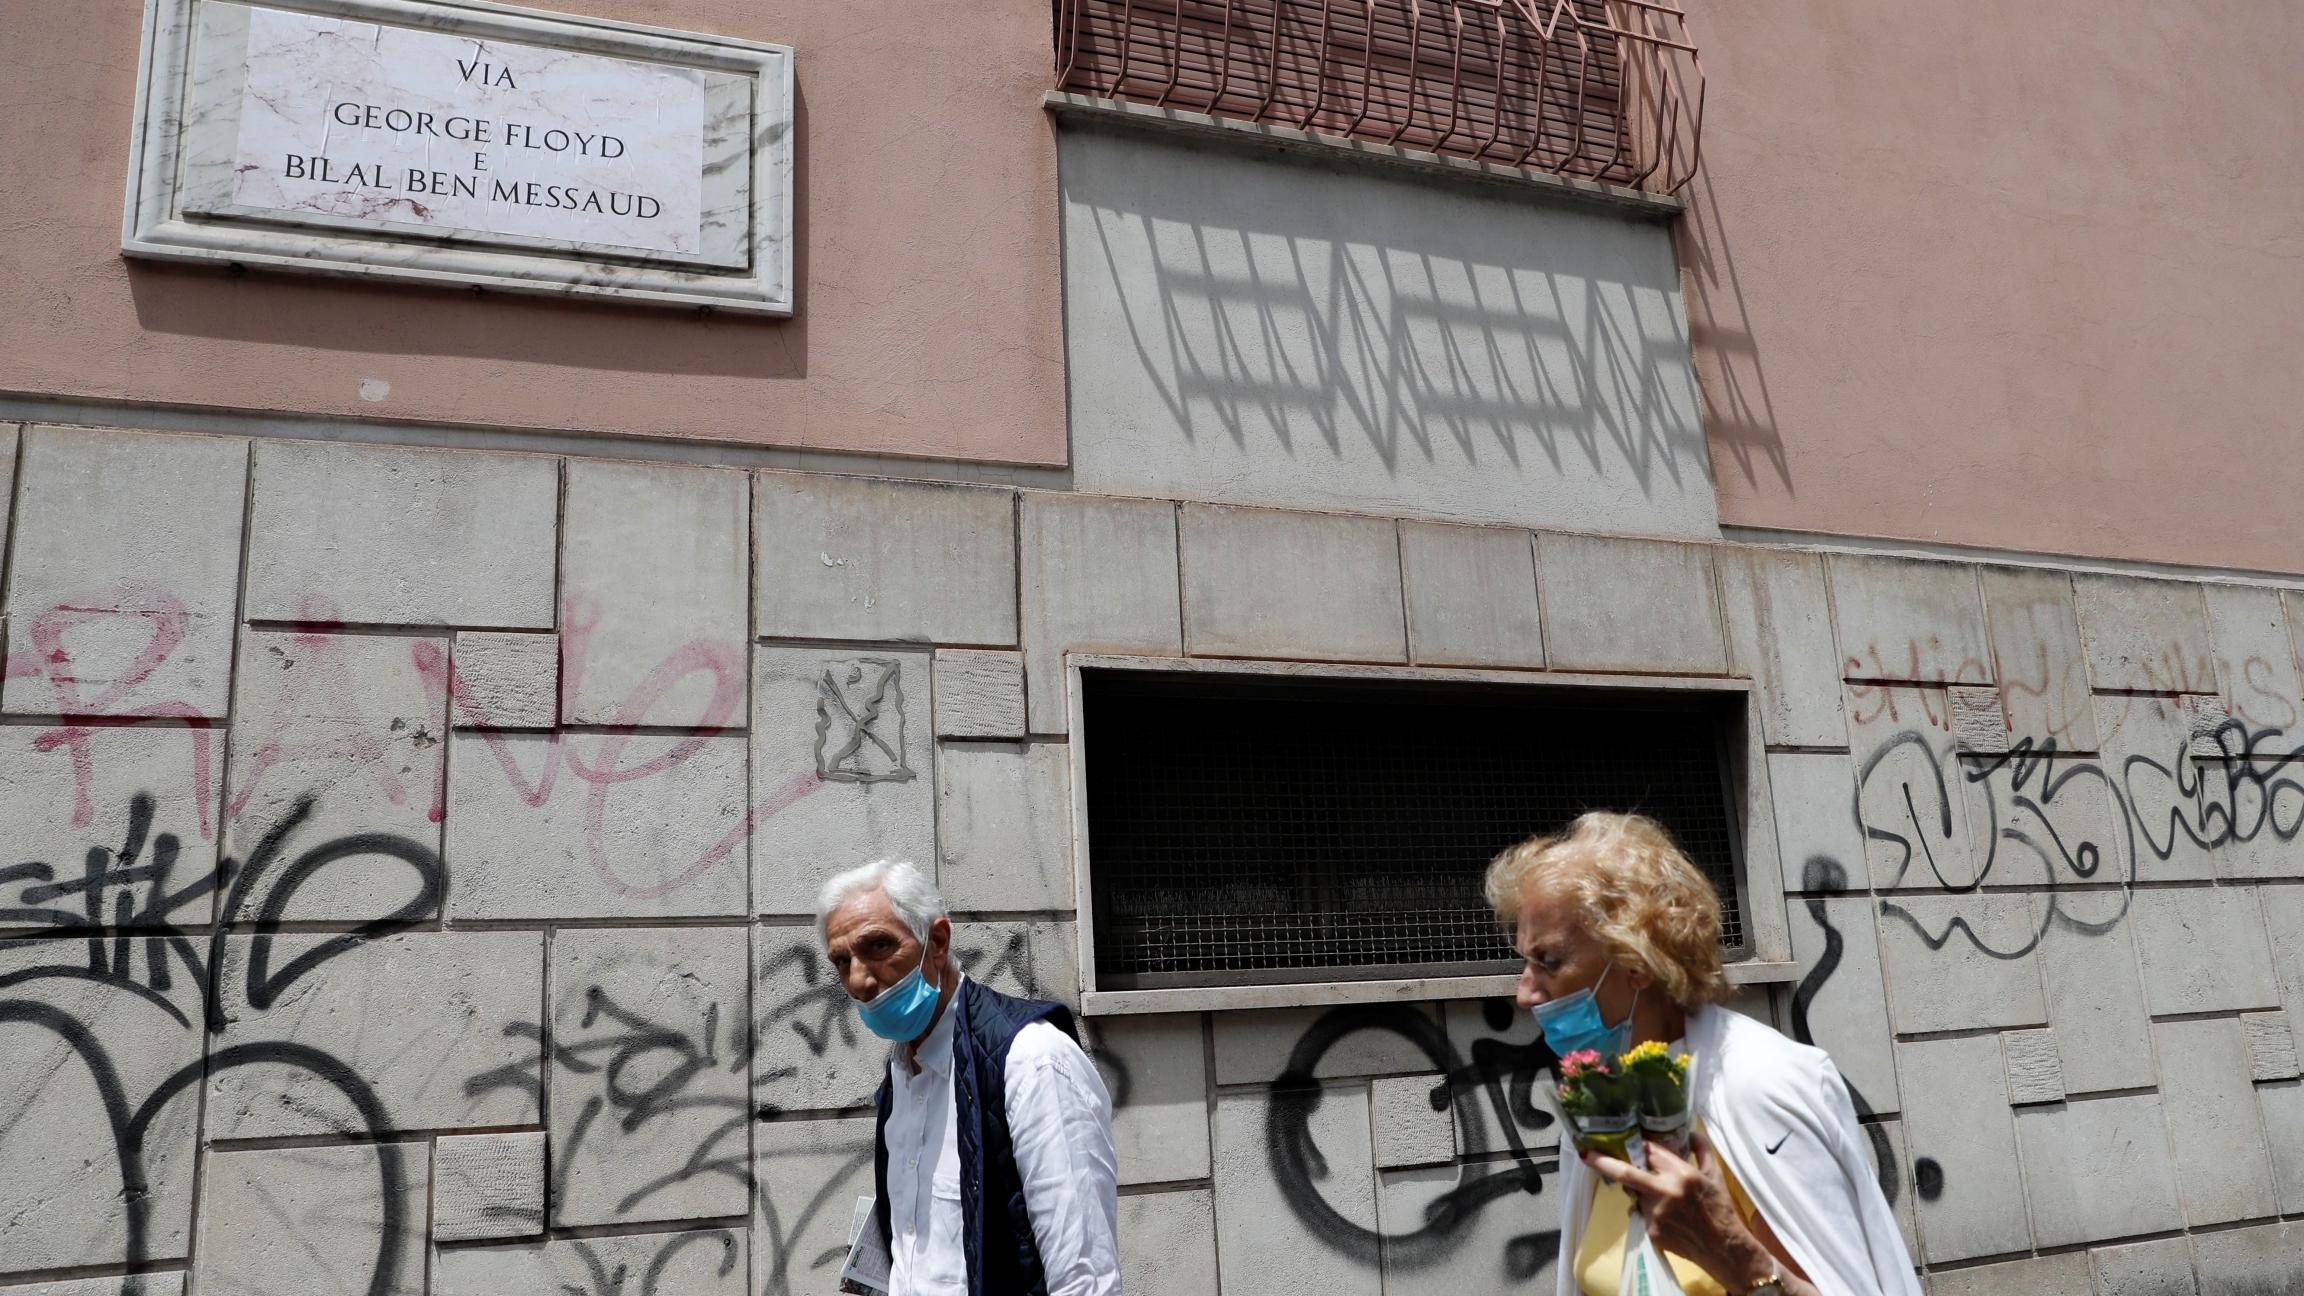 People walk near the former street sign for ''Via dell'Amba Aradam''